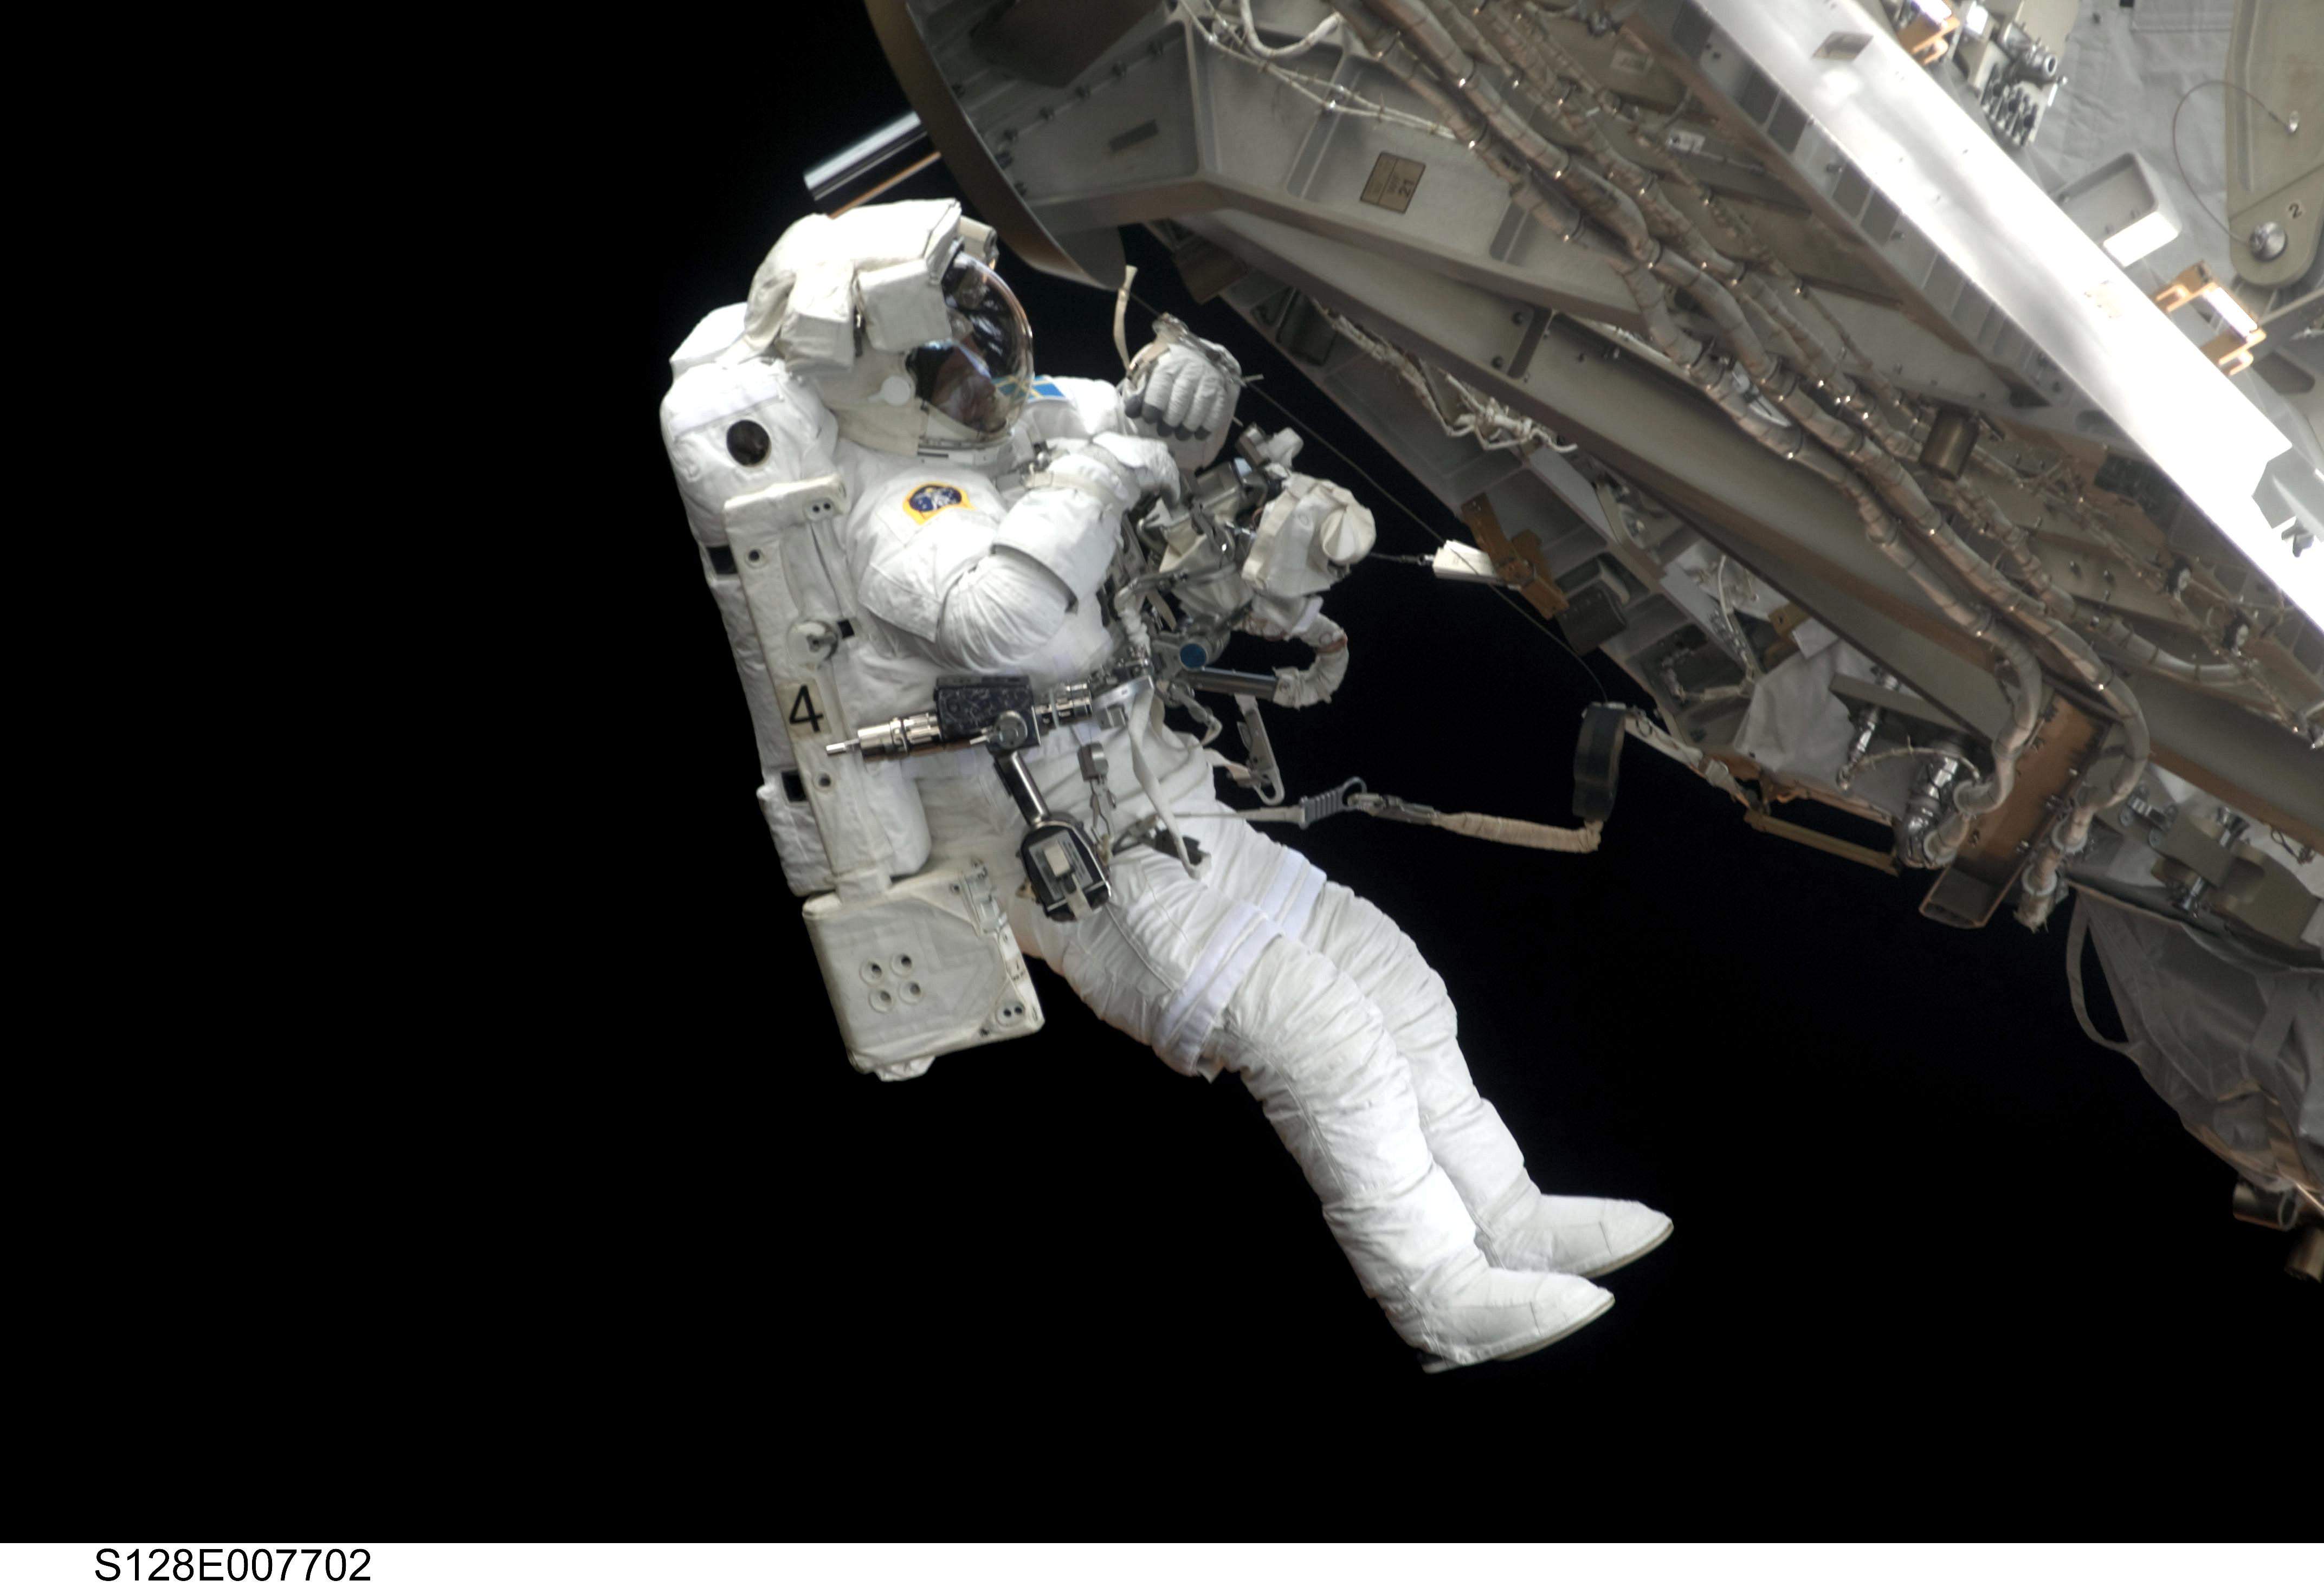 astronaut space walk-#16